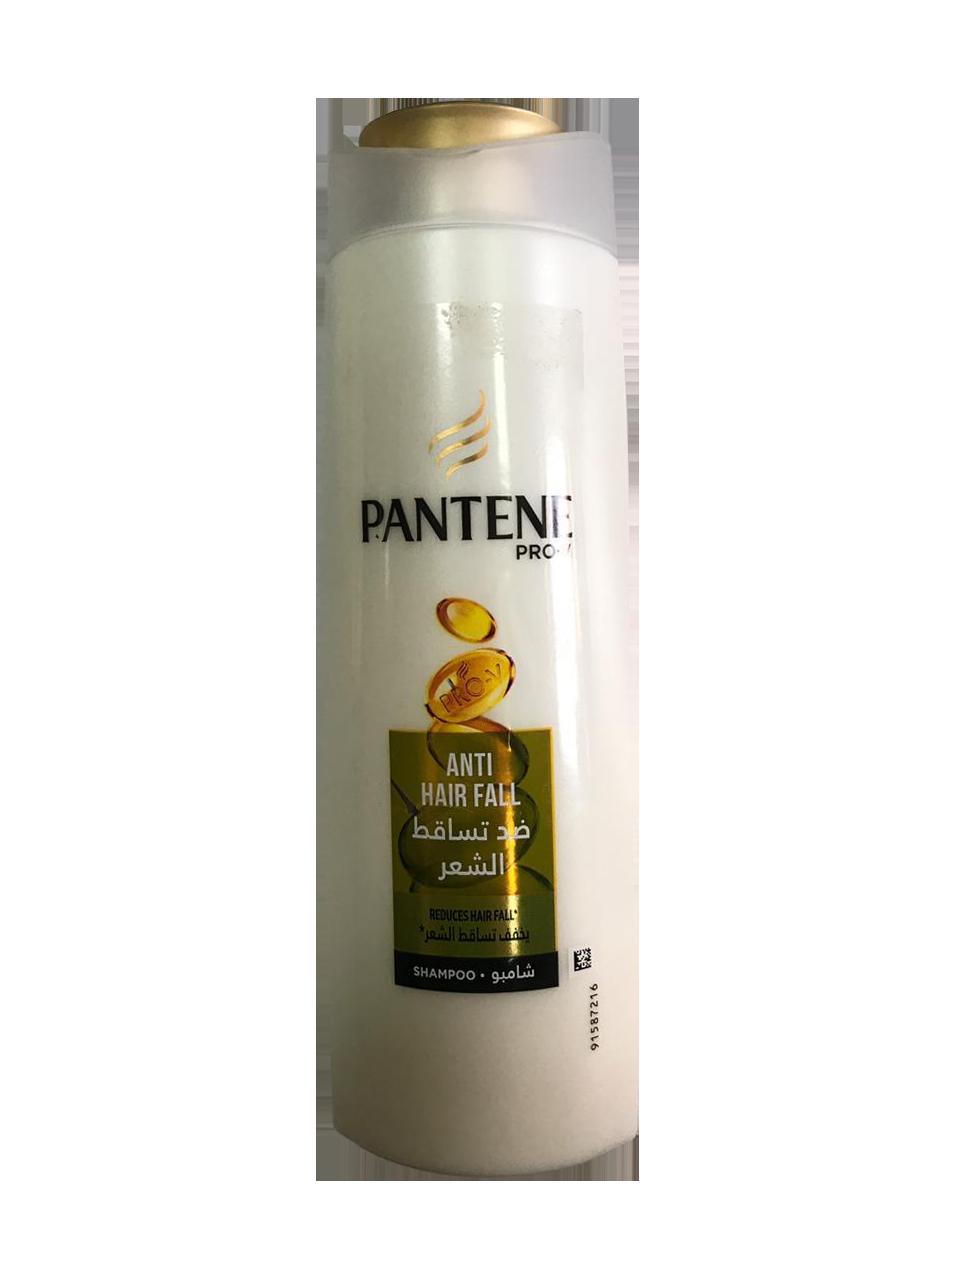 Pantene Anti Hairfall Shampoo 400ml